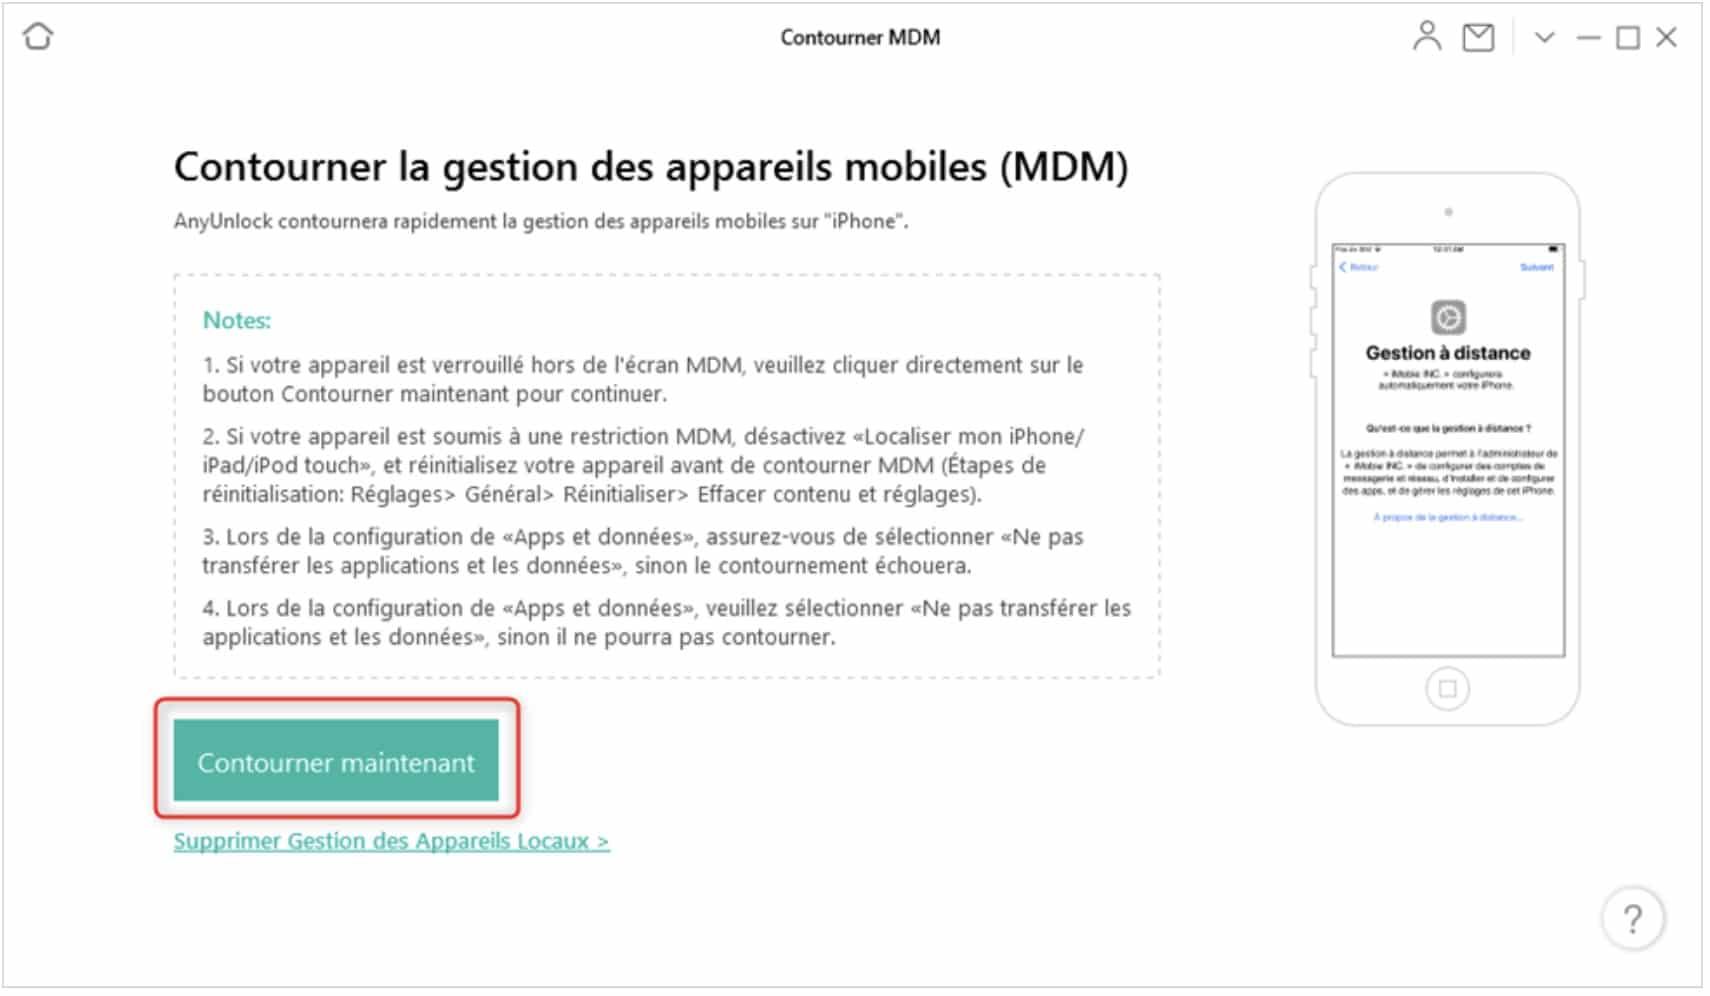 contourner mdm gestion des appareils mobiles apple